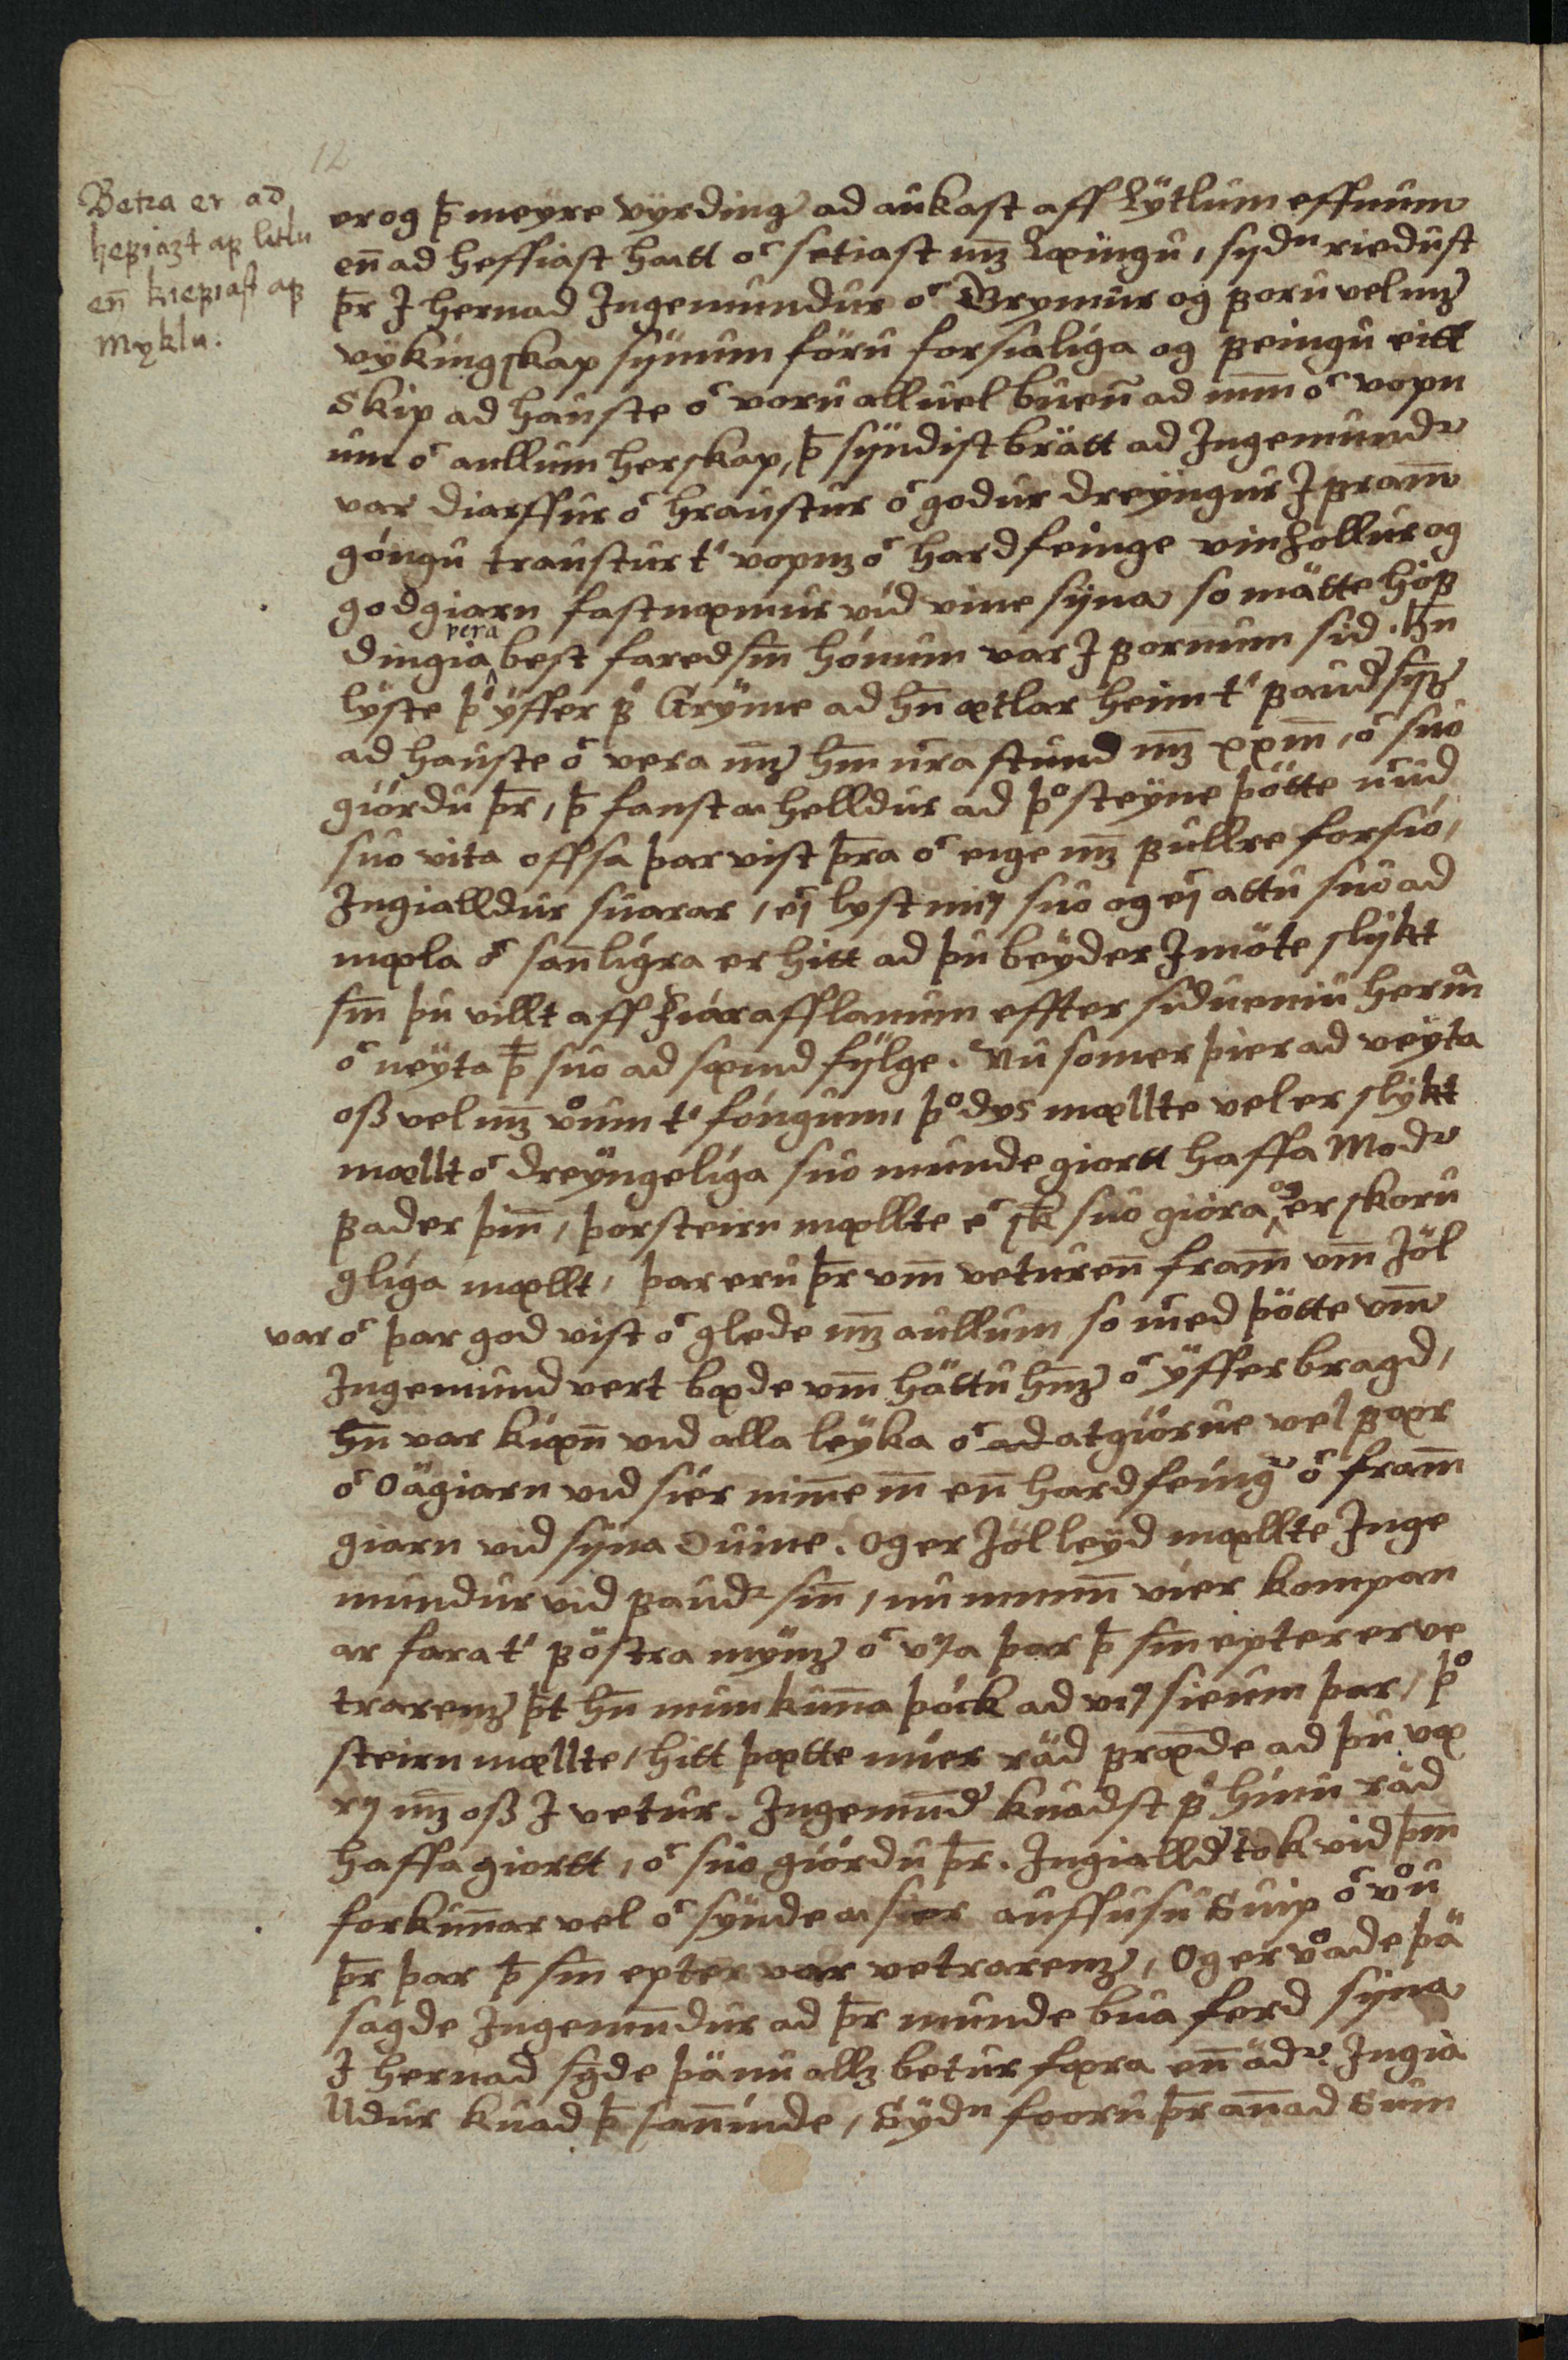 AM 138 fol - 6v